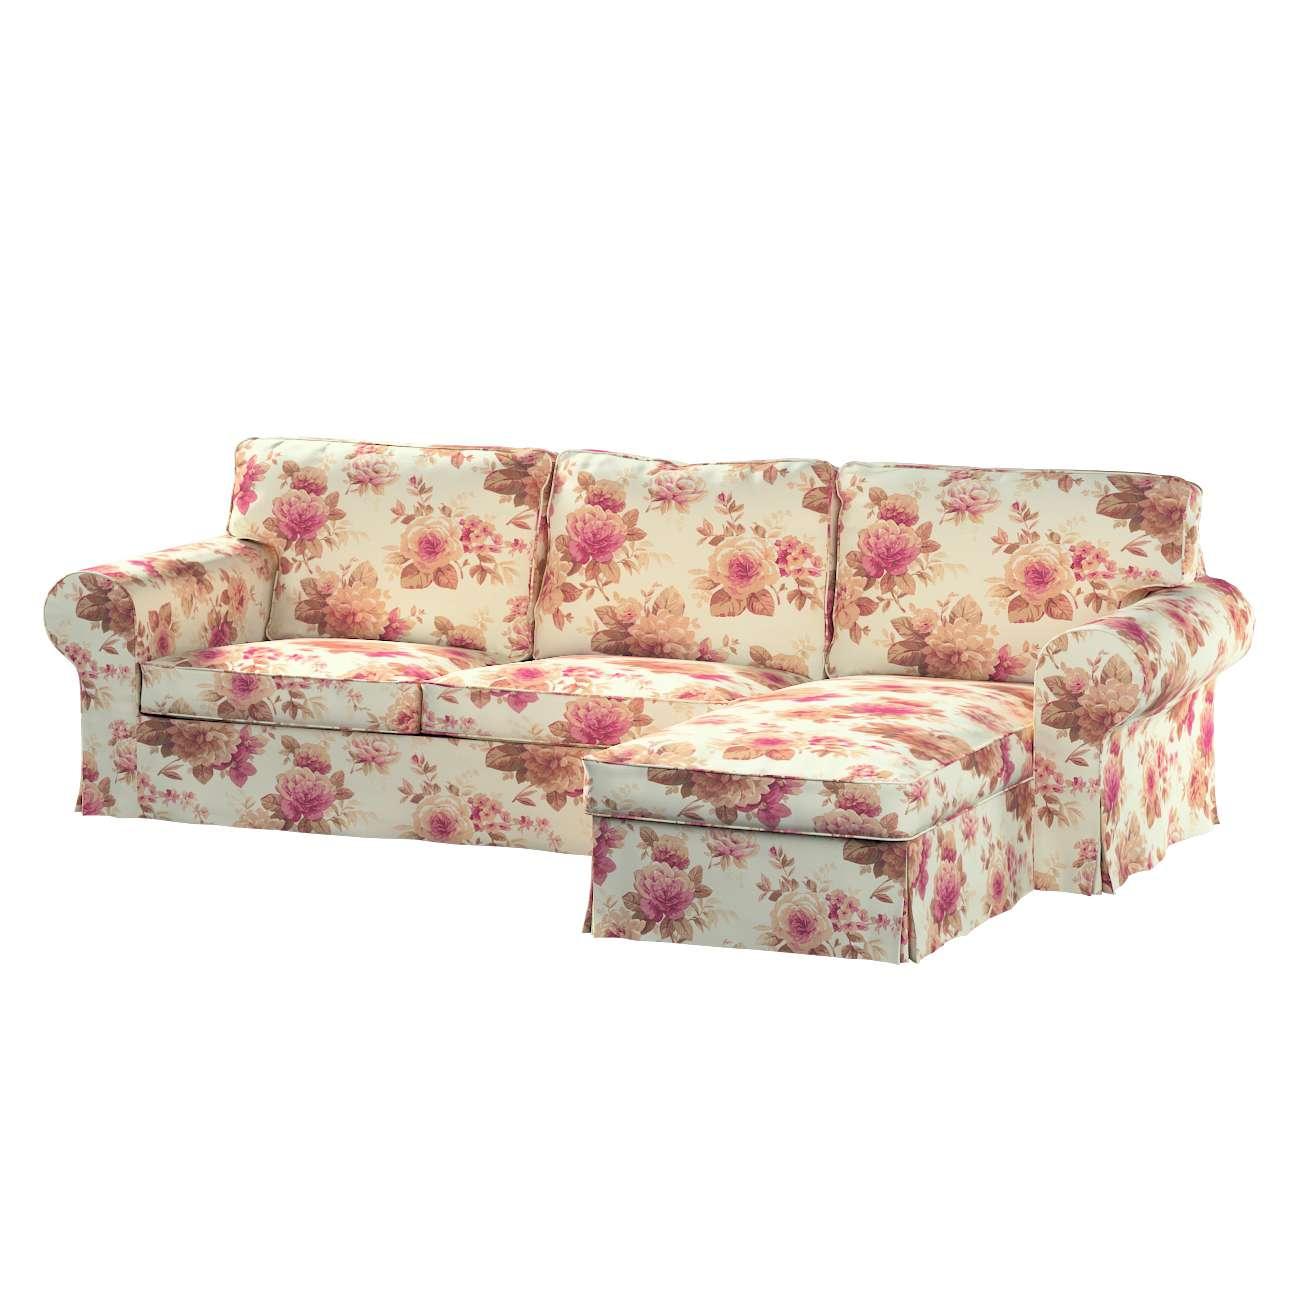 Ektorp 2-Sitzer Sofabezug mit Recamiere Ektorp 2-Sitzer Sofabezug mit Recamiere von der Kollektion Mirella, Stoff: 141-06